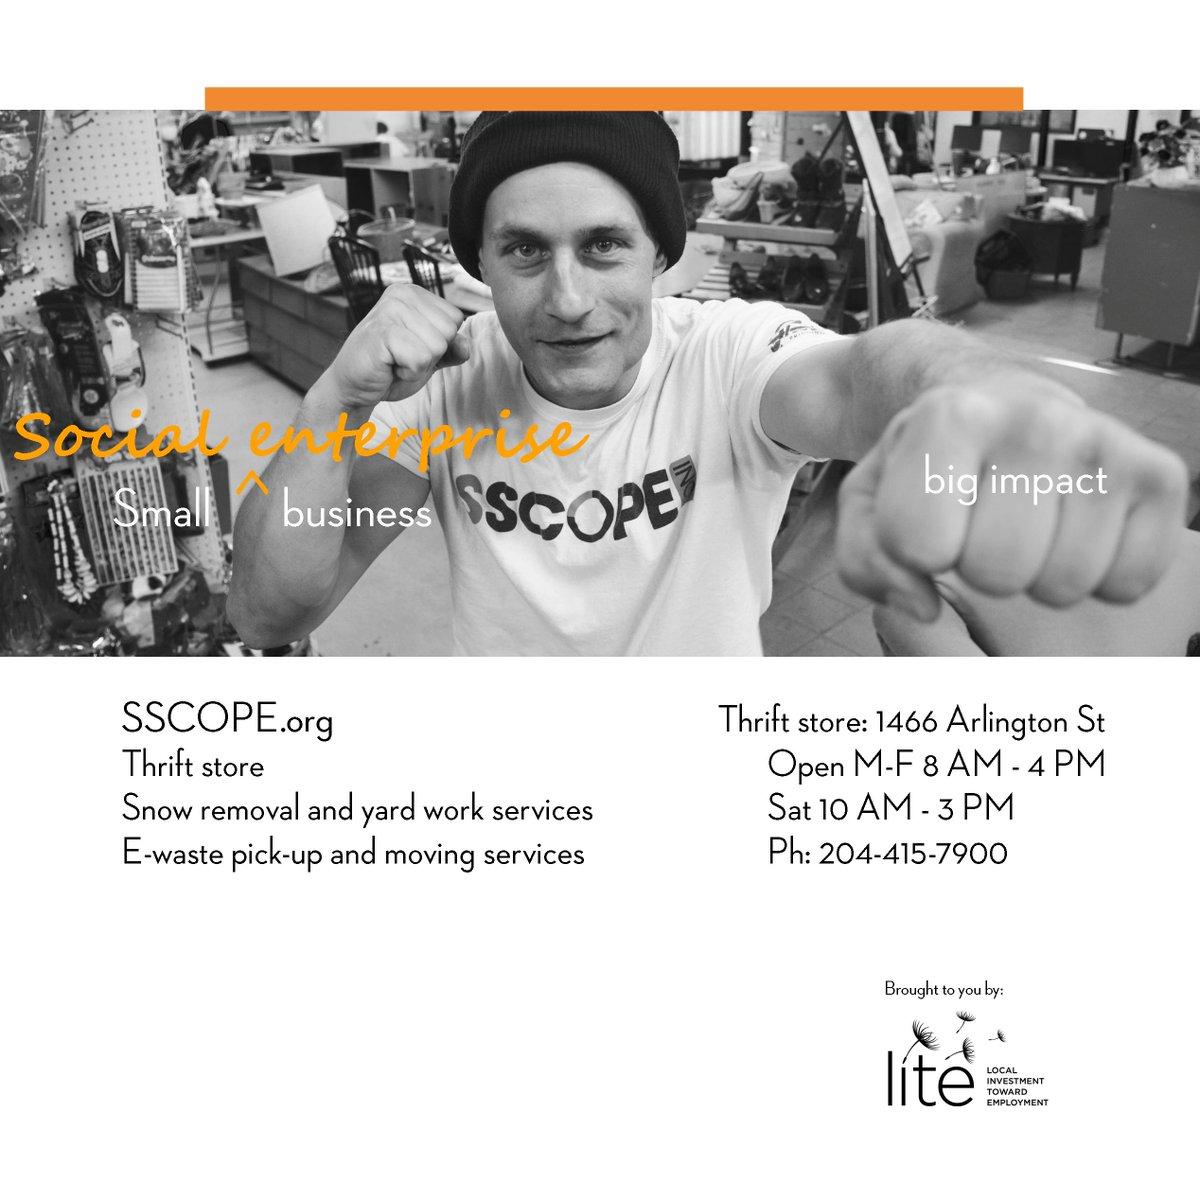 This #small #business adds #impact! Check out @sscopeinc, #Winnipeg! @TheWpgChamber #SmallBusiness #socialenterprise<br>http://pic.twitter.com/JWSZXmxcPx